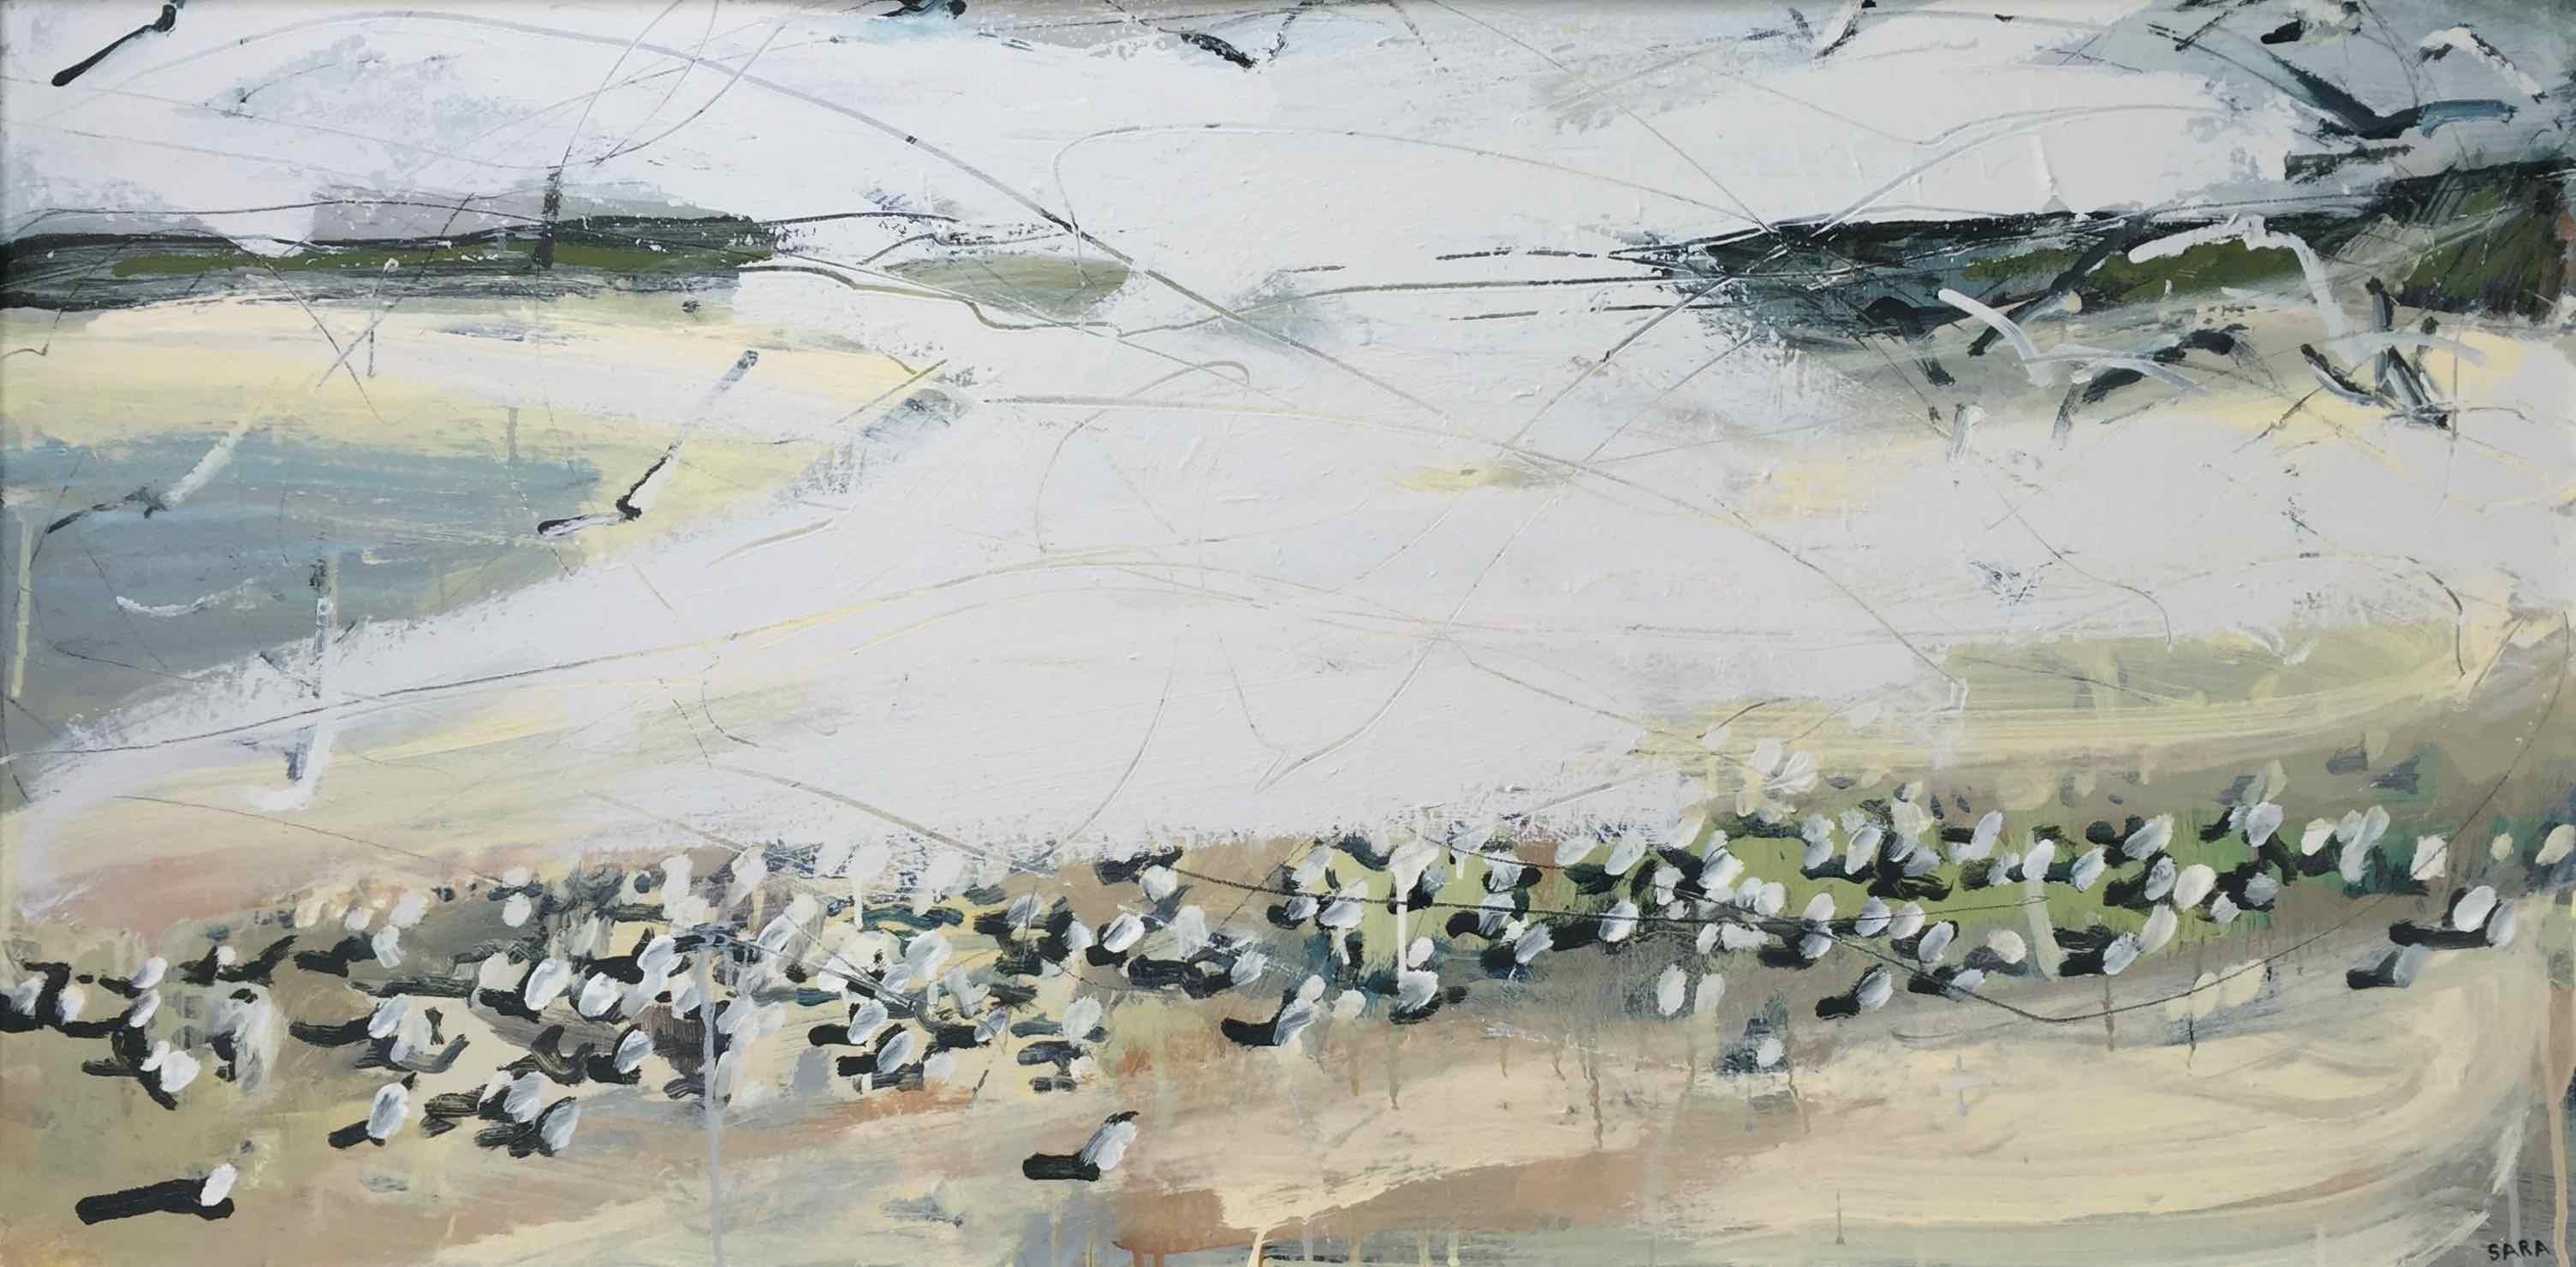 Sandpipers and Arctic Terns 1 (Northumberland): Oil Painting by Sara Dudman RWA